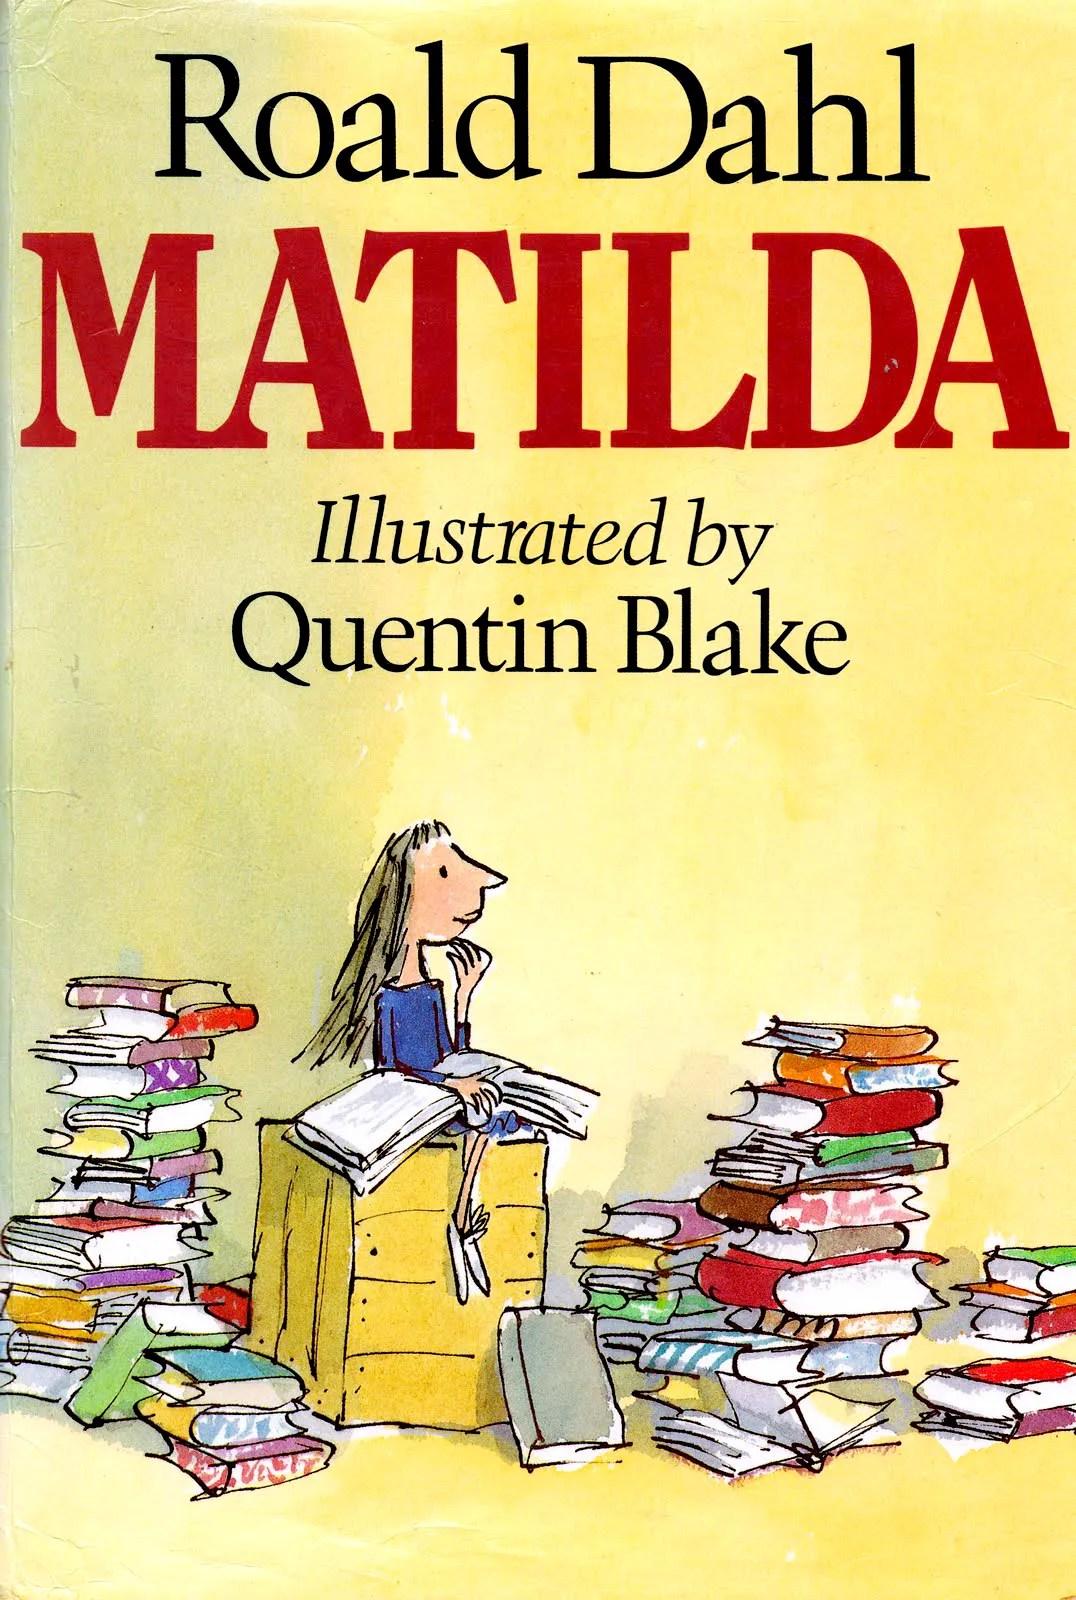 """Matilda"" by Roald Dahl."